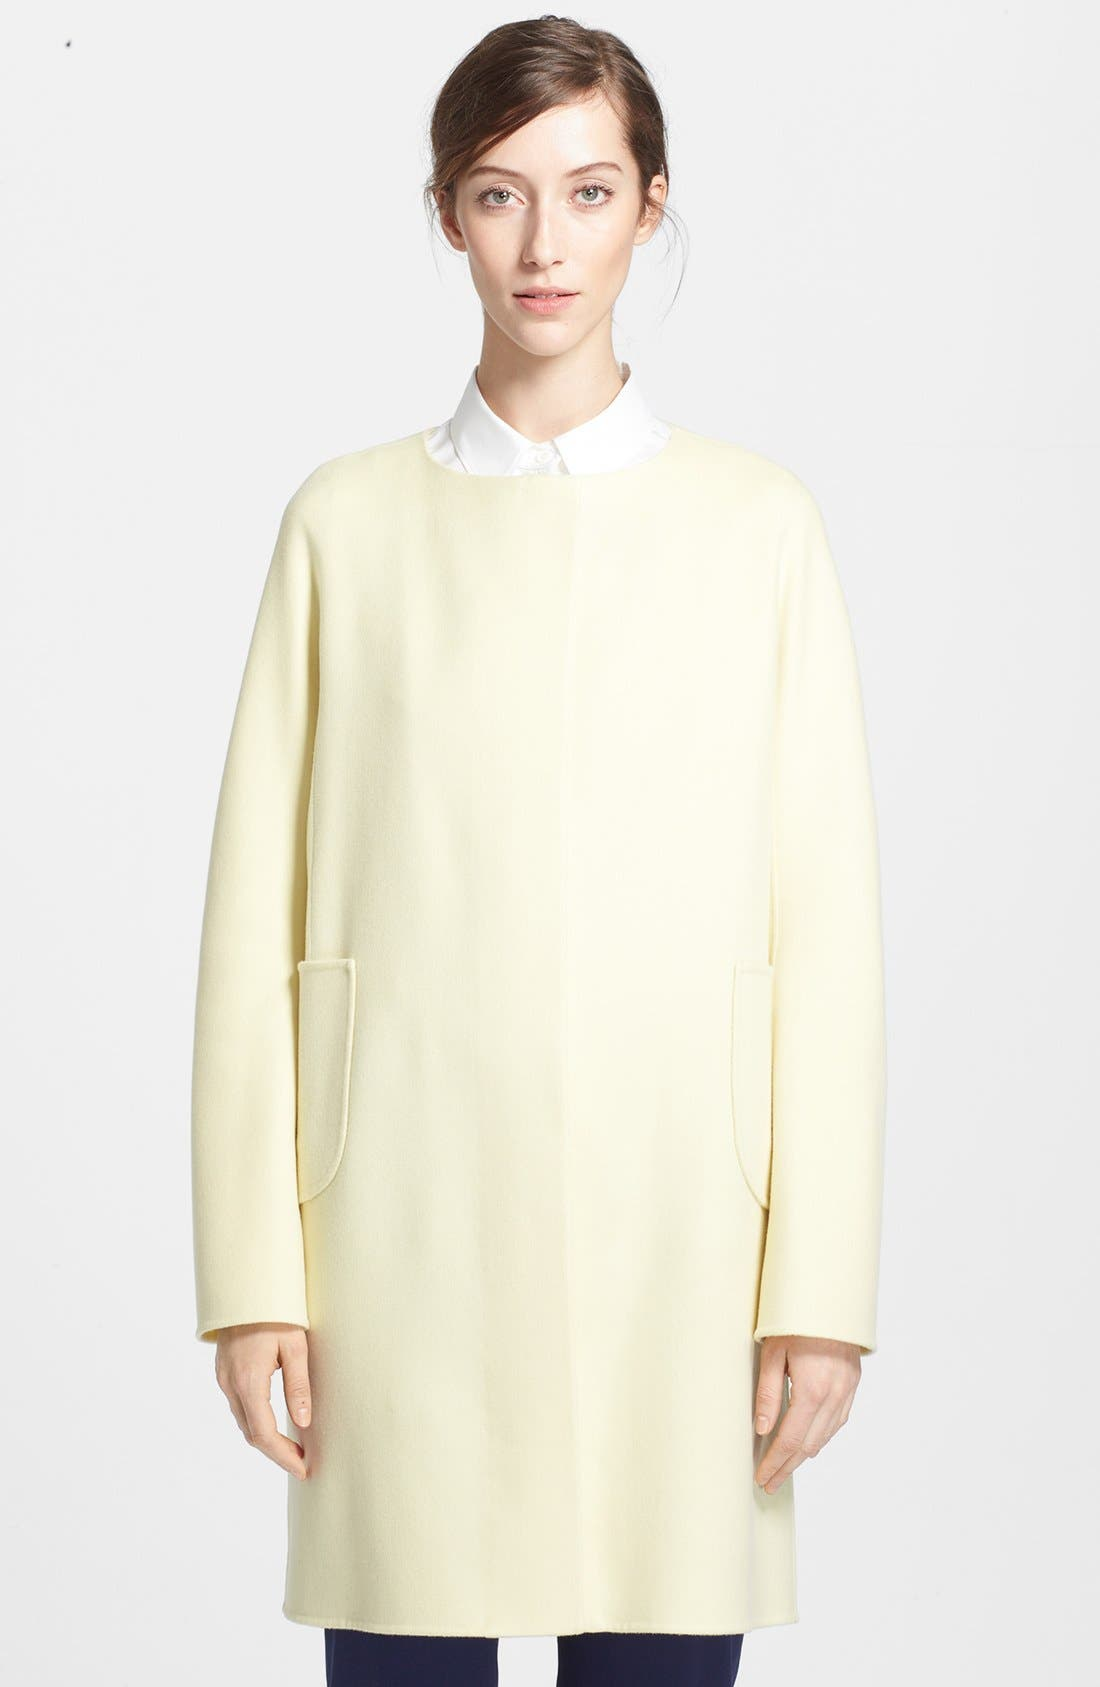 Alternate Image 1 Selected - Jil Sander Double Face Cashmere Coat